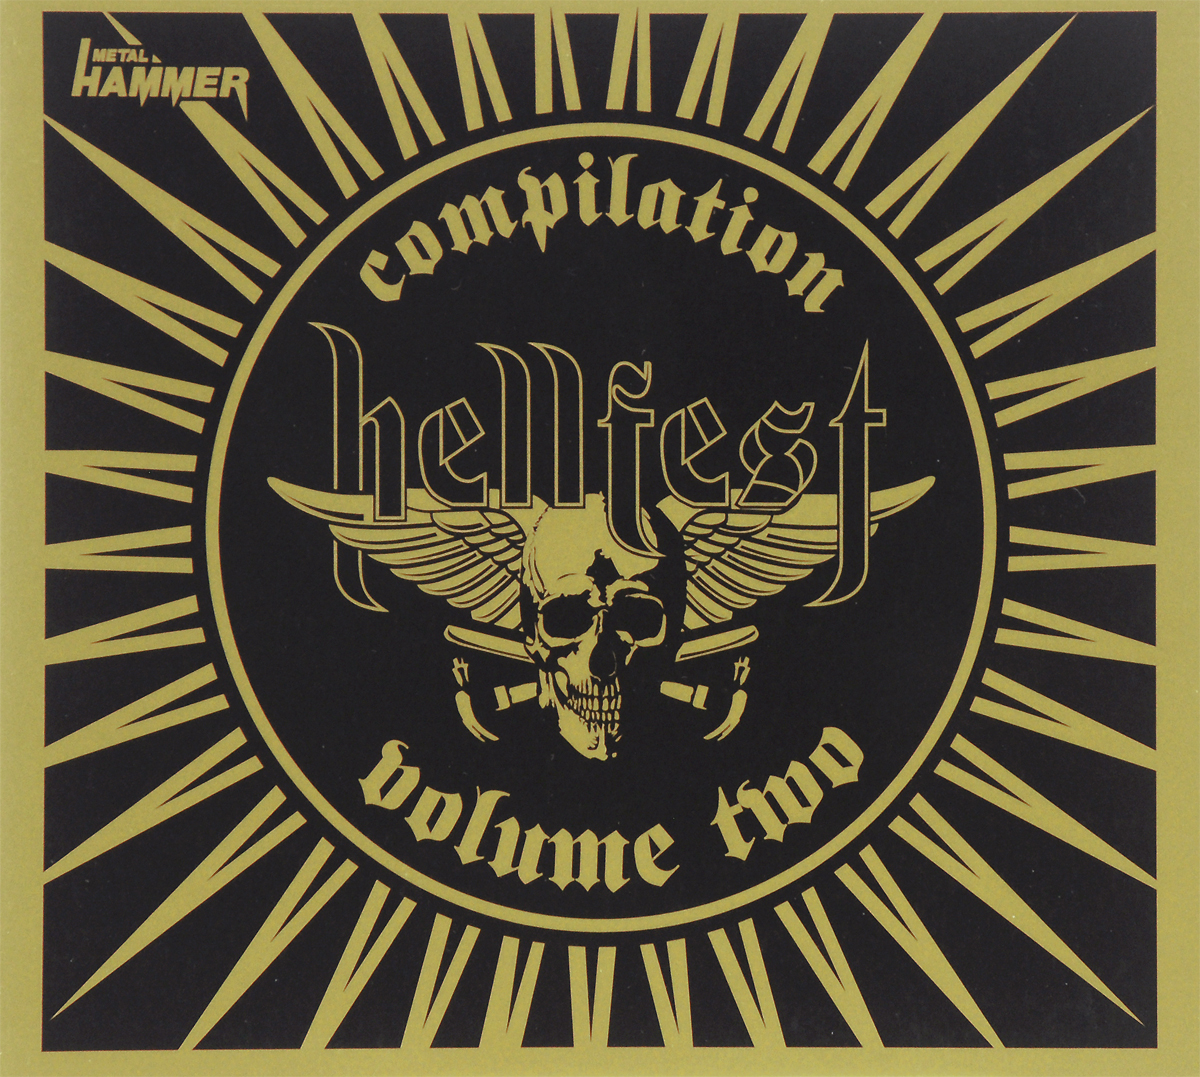 Machine Head,Unearth,The Haunted,Killswitch Engage,Caliban,Ektomorf,Kataklysm,Illdisposed,Disbelief,Hypocrisy,Cradle Of Filth,In Flames,Lacuna Coil,Amorphis,Amon Amarth,Dimmu Borgir,Legion The Damned,Trivium,Heaven Shall Burn,Soilwork Hellfest Compilation. Vol. 2 (2 CD)